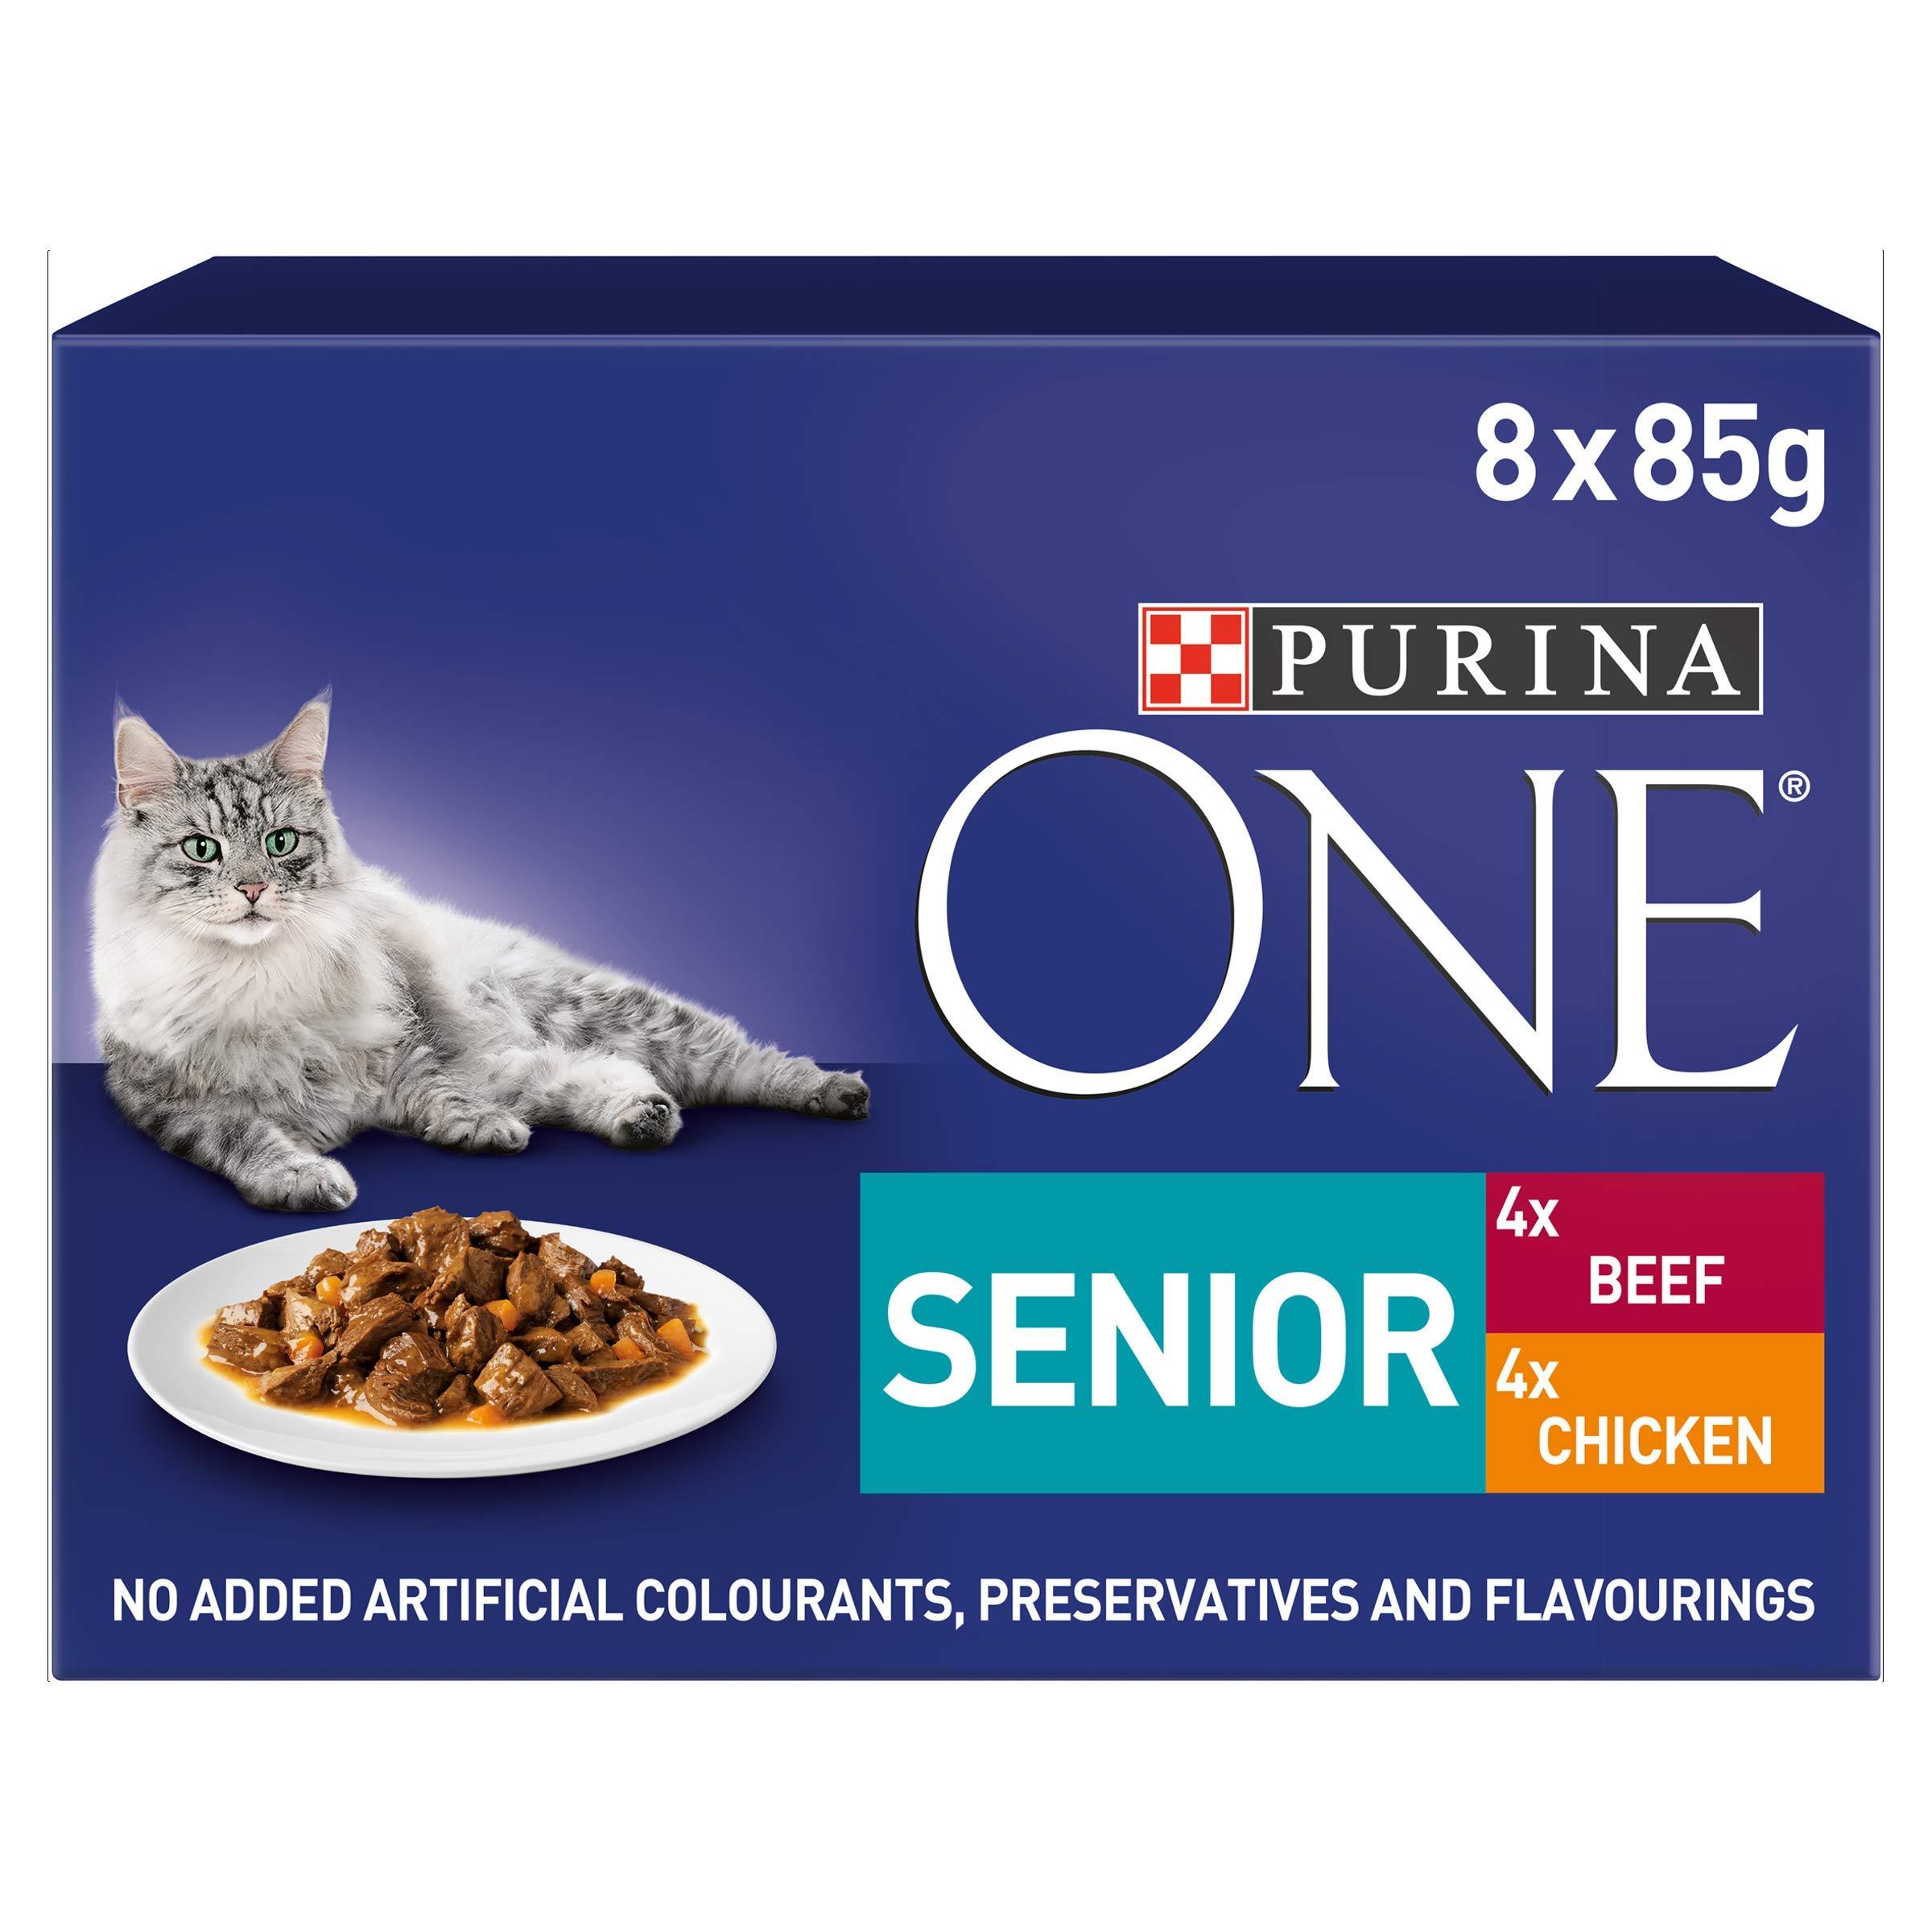 PURINA ONE Comida para Gatos Senior 7+, de Pollo y Carne, 40 Bolsas de 85 g (5 x 8)